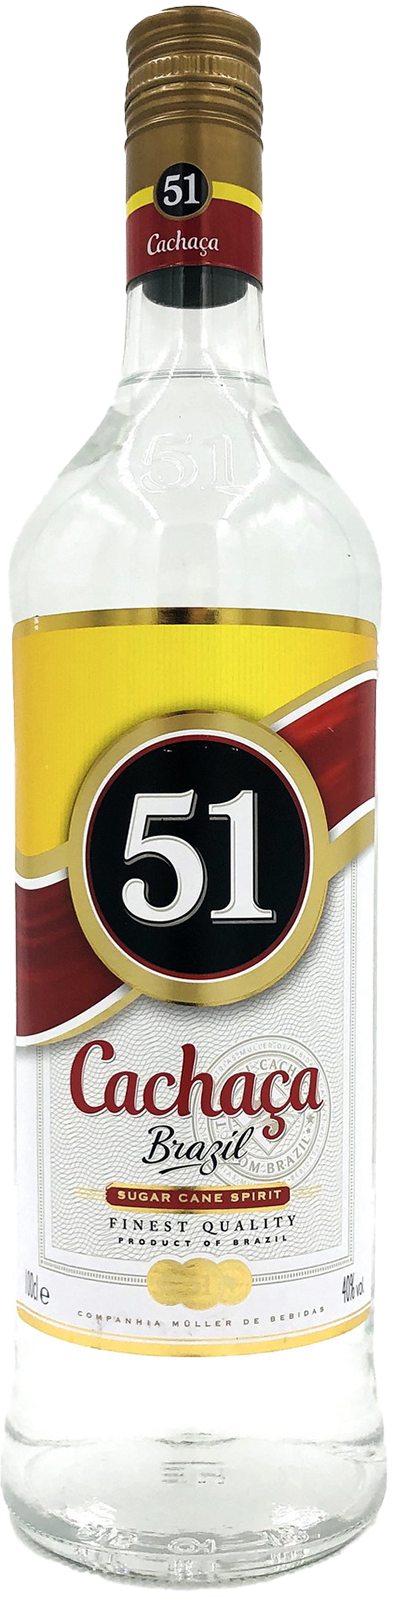 NV-Pir 51 Cachaca